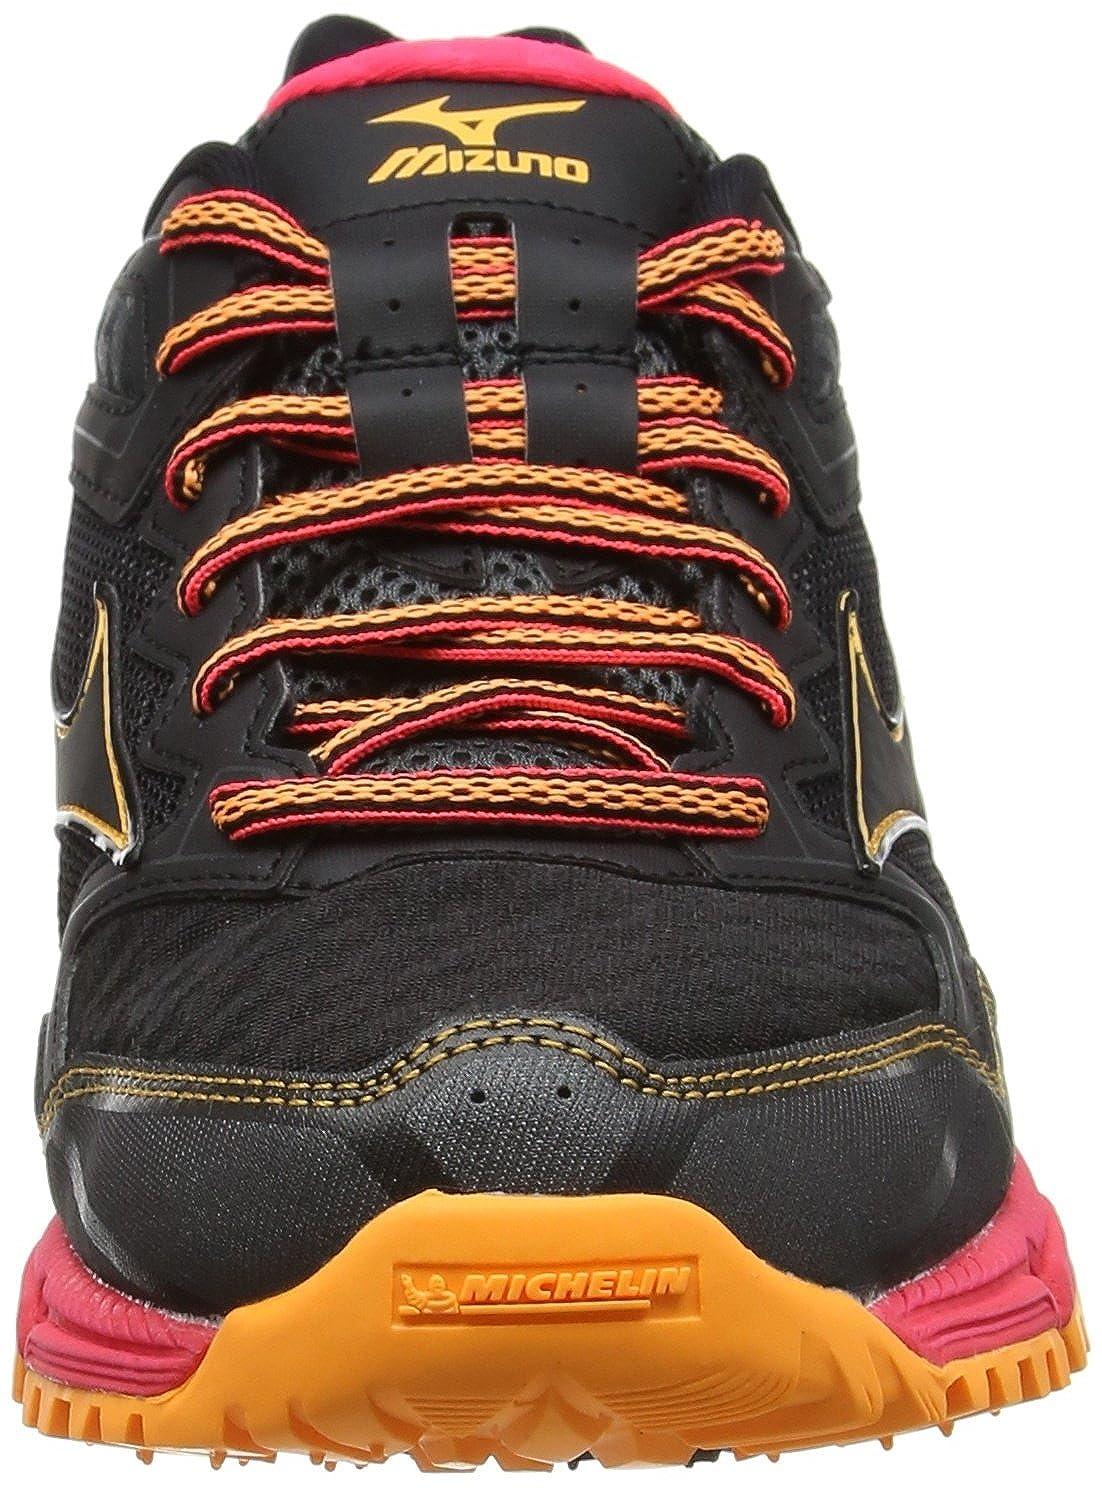 Mizuno Wave Daichi 2 Negro J1GD1771 Zapatillas de Running